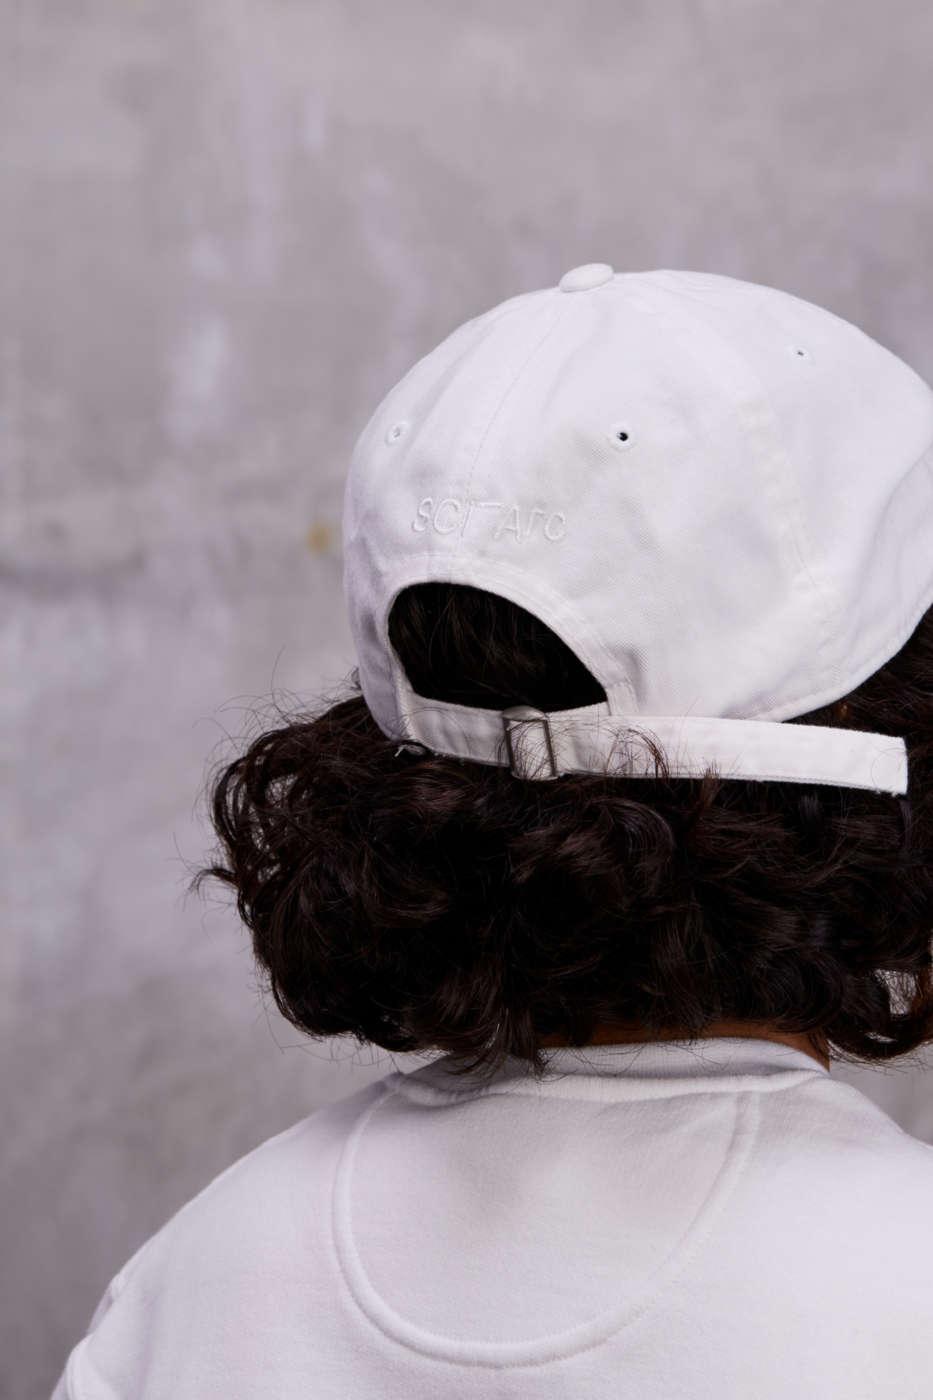 sciarc logo backside of white hat